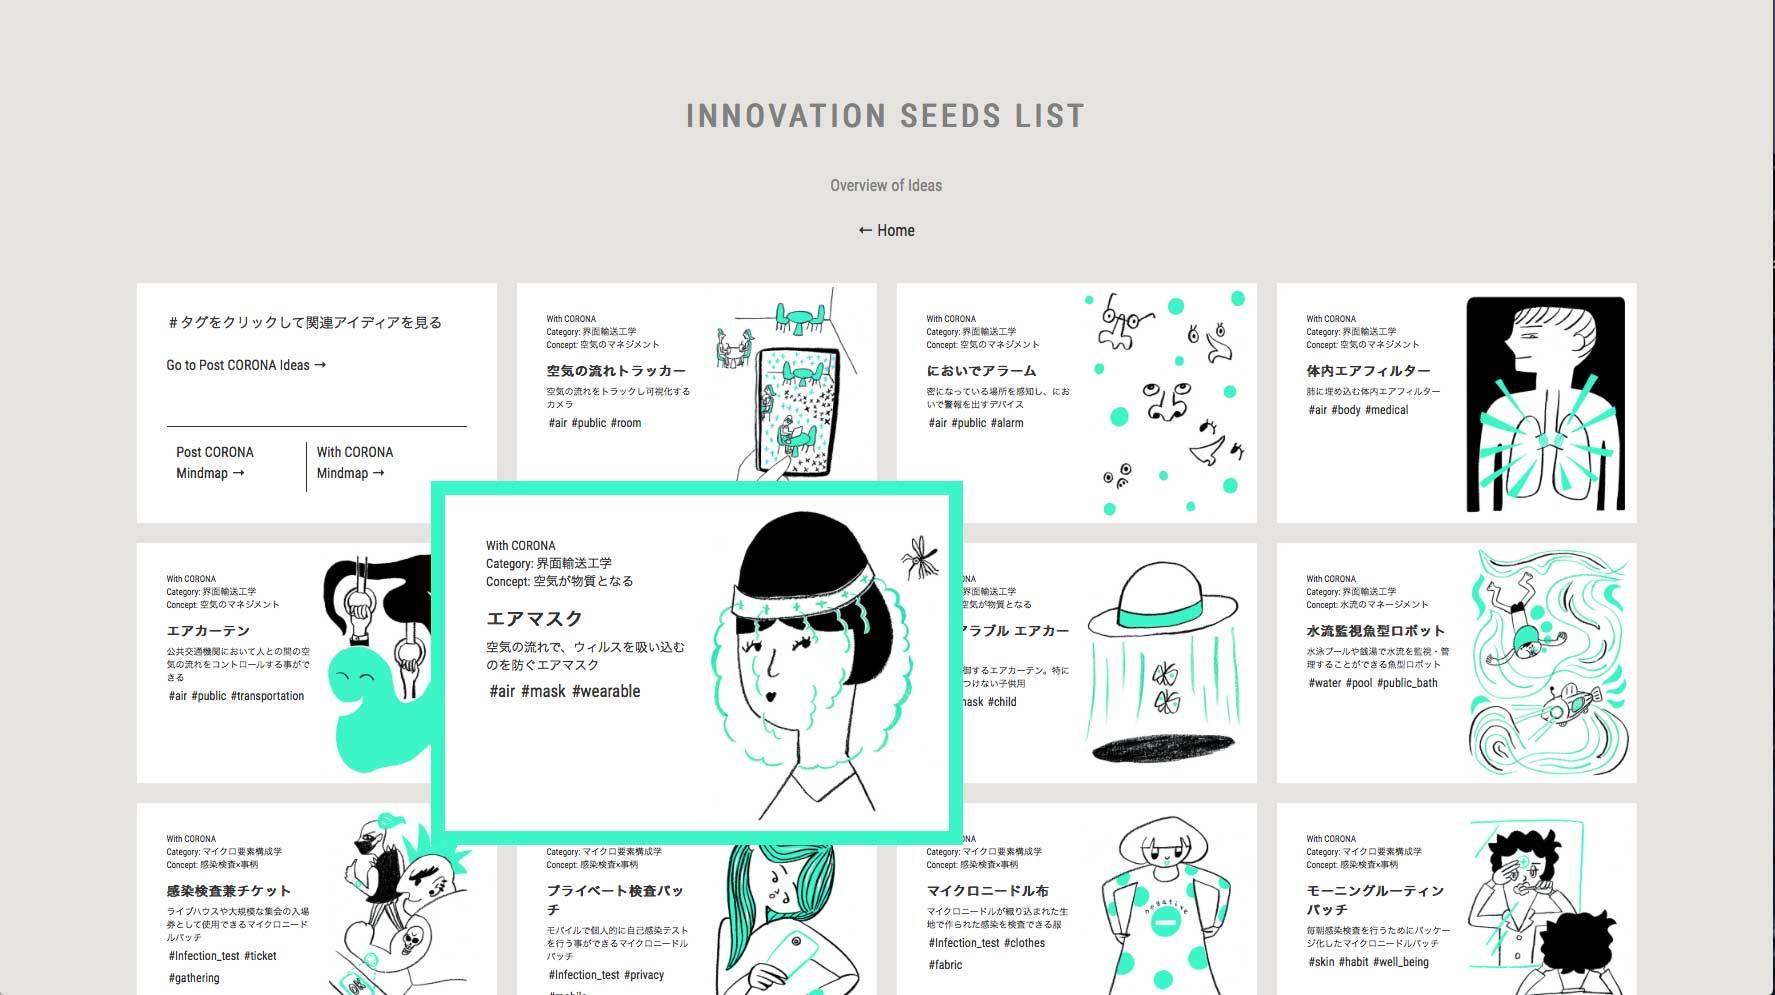 INNOVATION SEEDS LIST illustration_a0048227_18195217.jpg